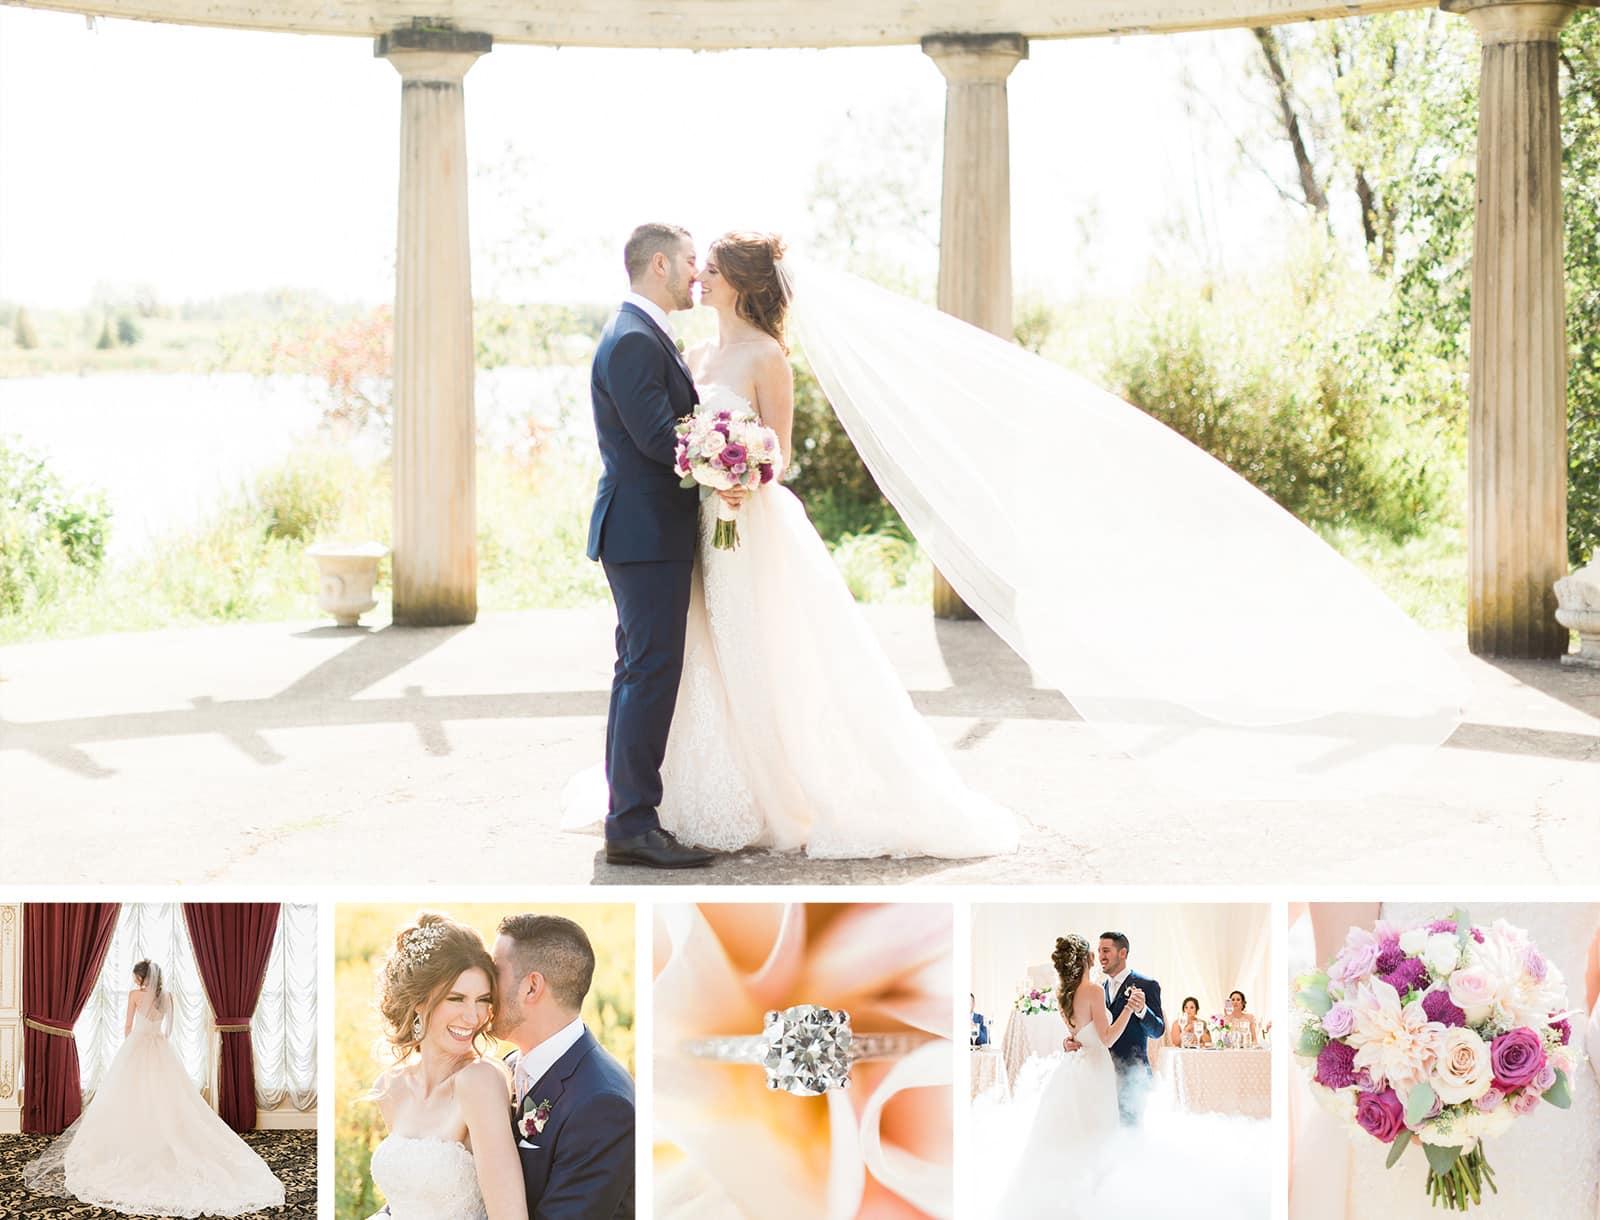 Elegant Summer Wedding at Chateau Le Jardin: Leanne + Joshua